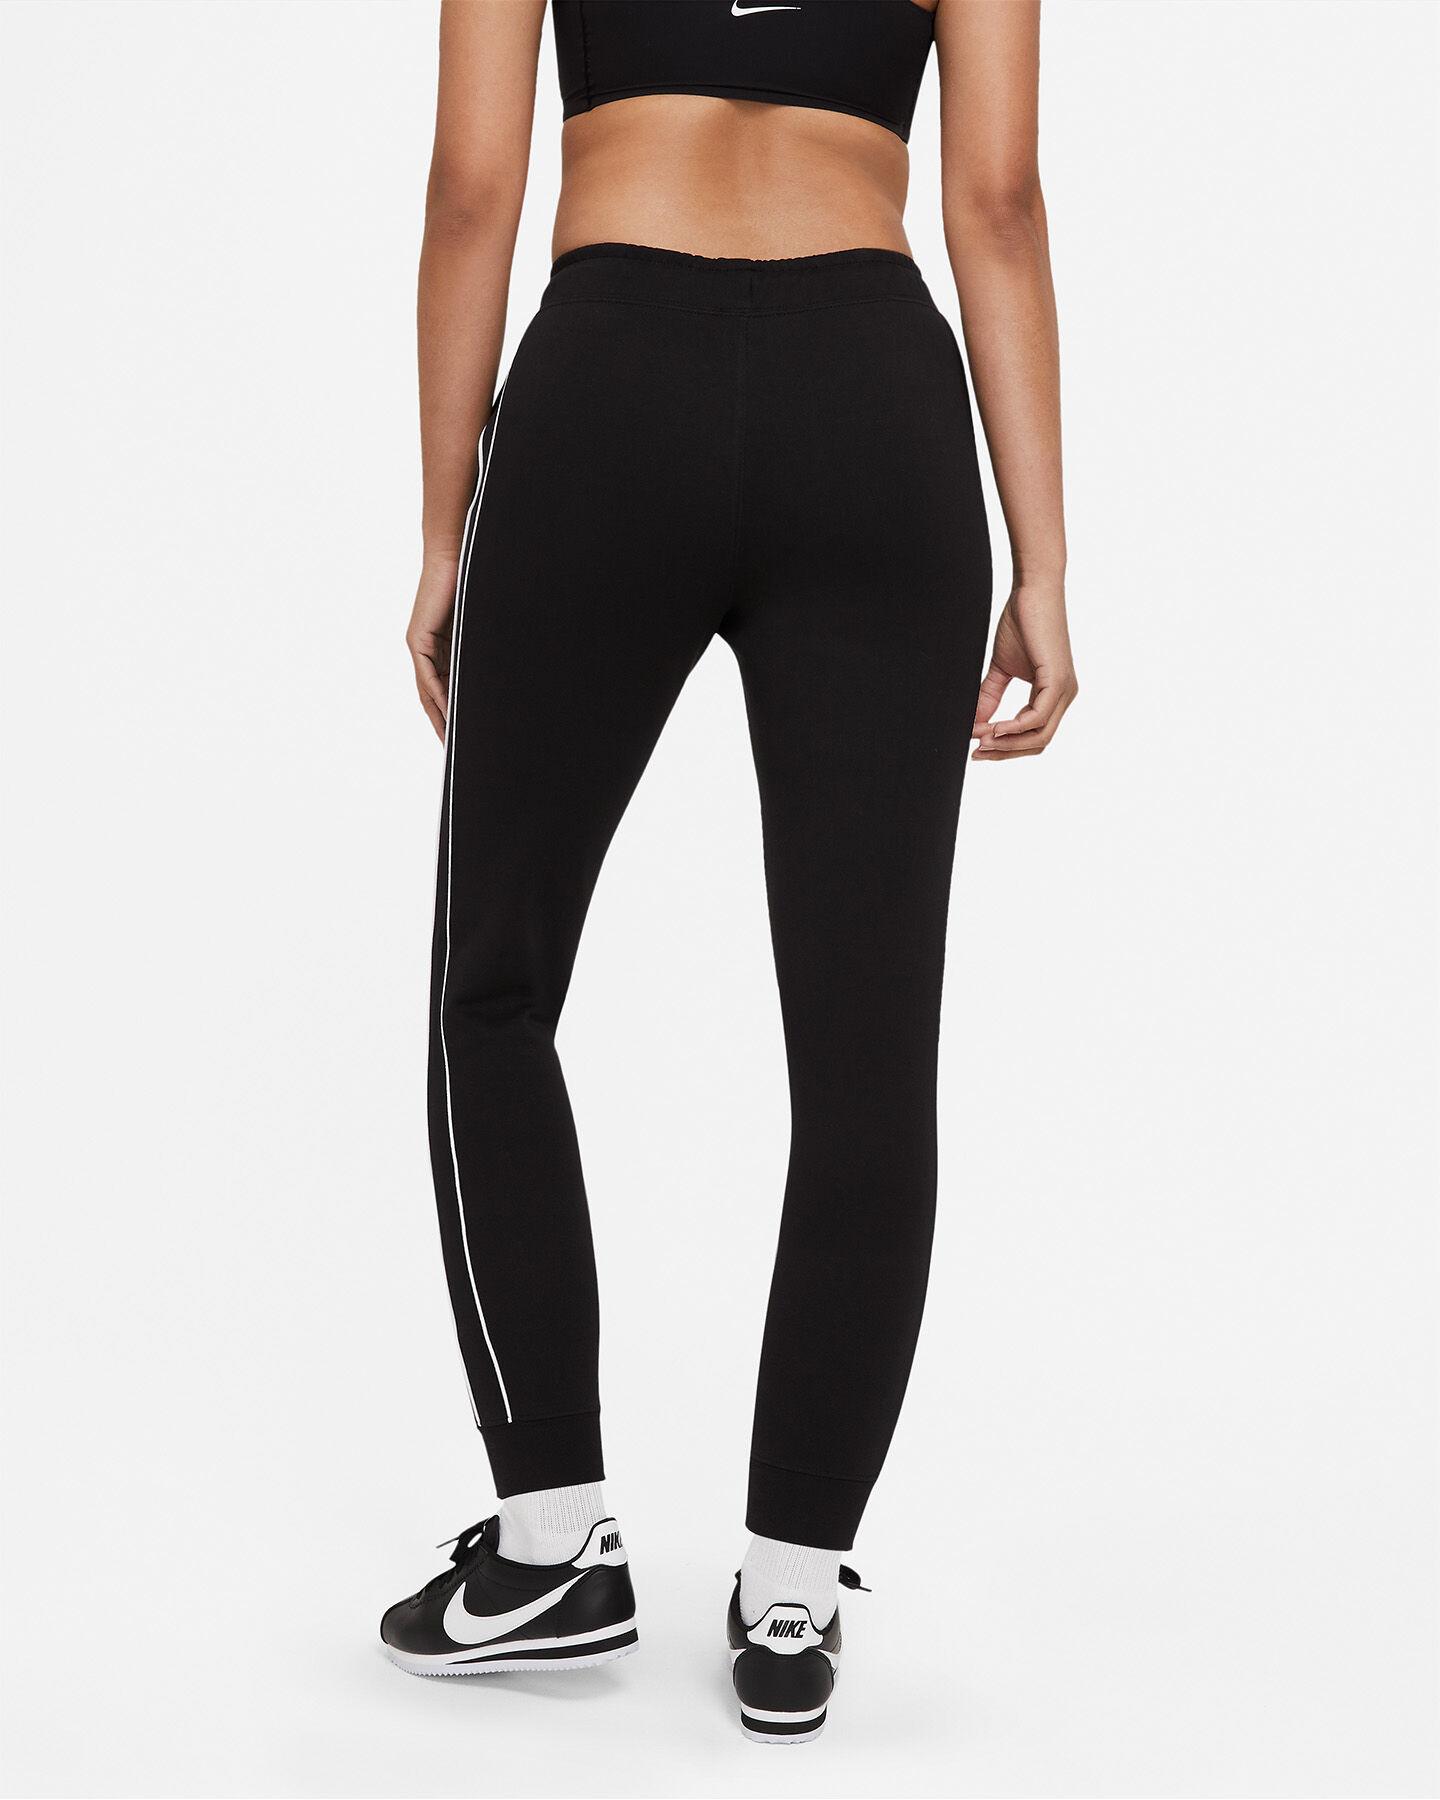 Pantalone NIKE DOUBLE W S5269767 scatto 1